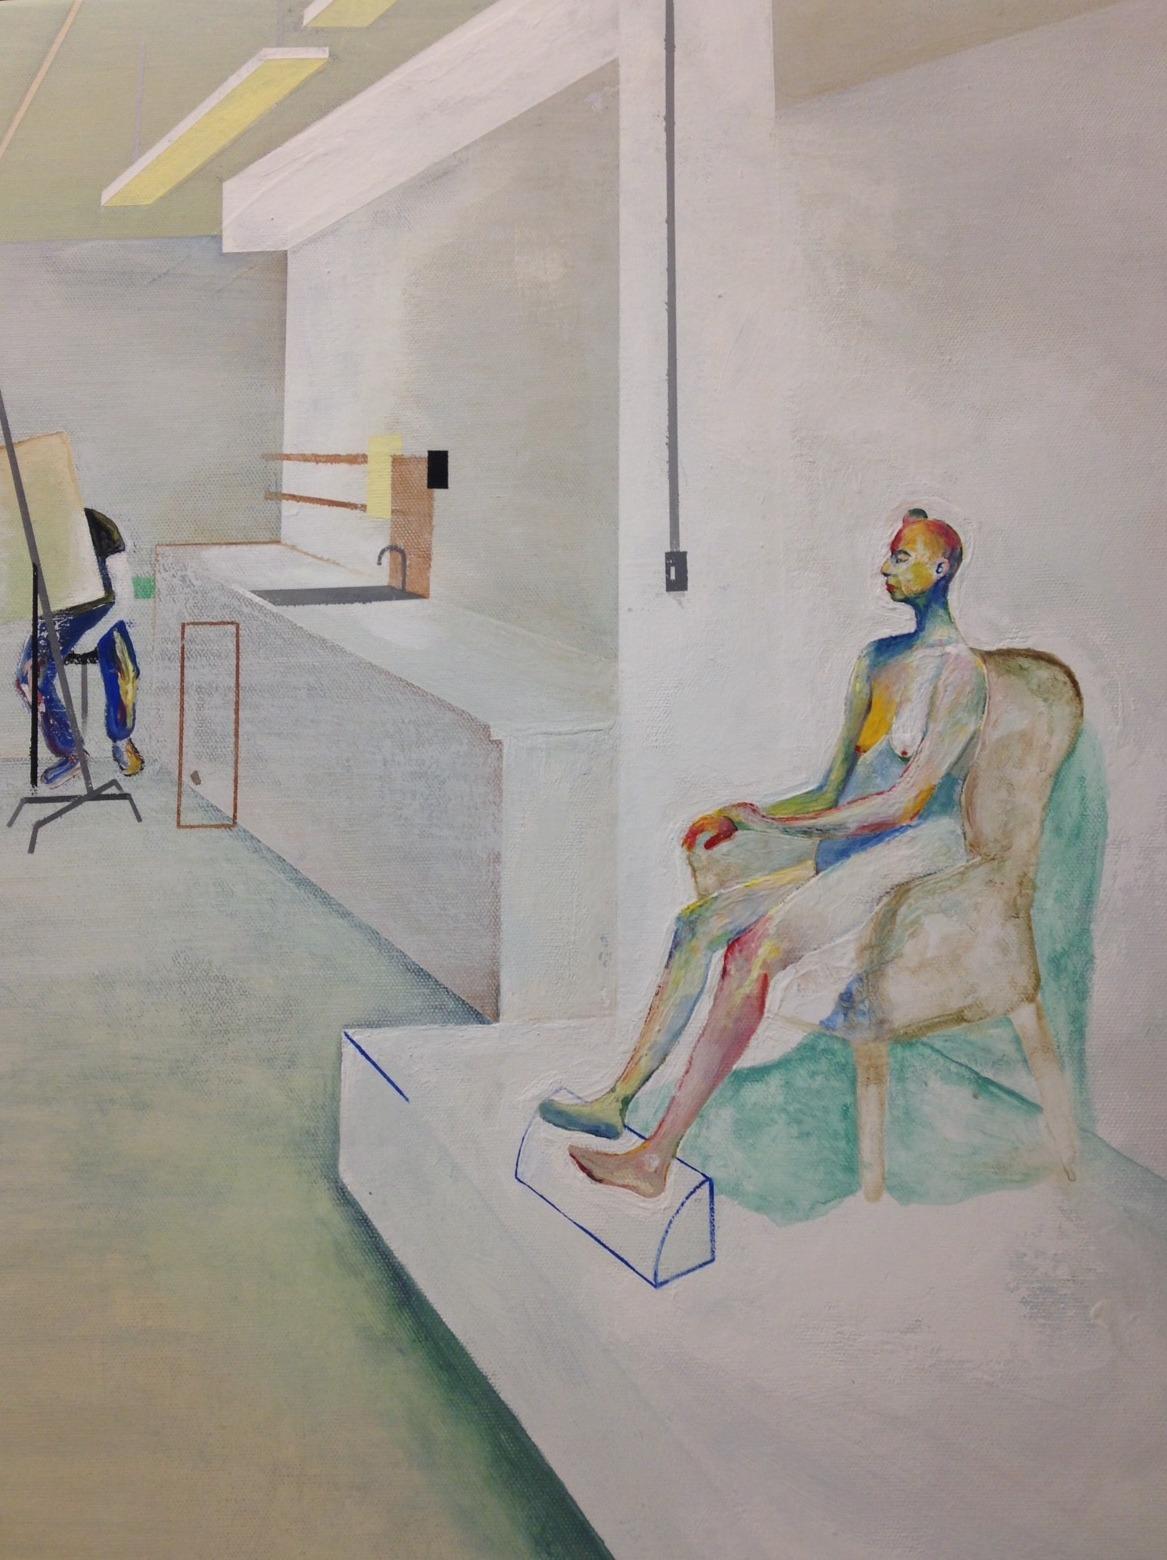 Untitled - Riku Iwanami, Student, Rockland Community College